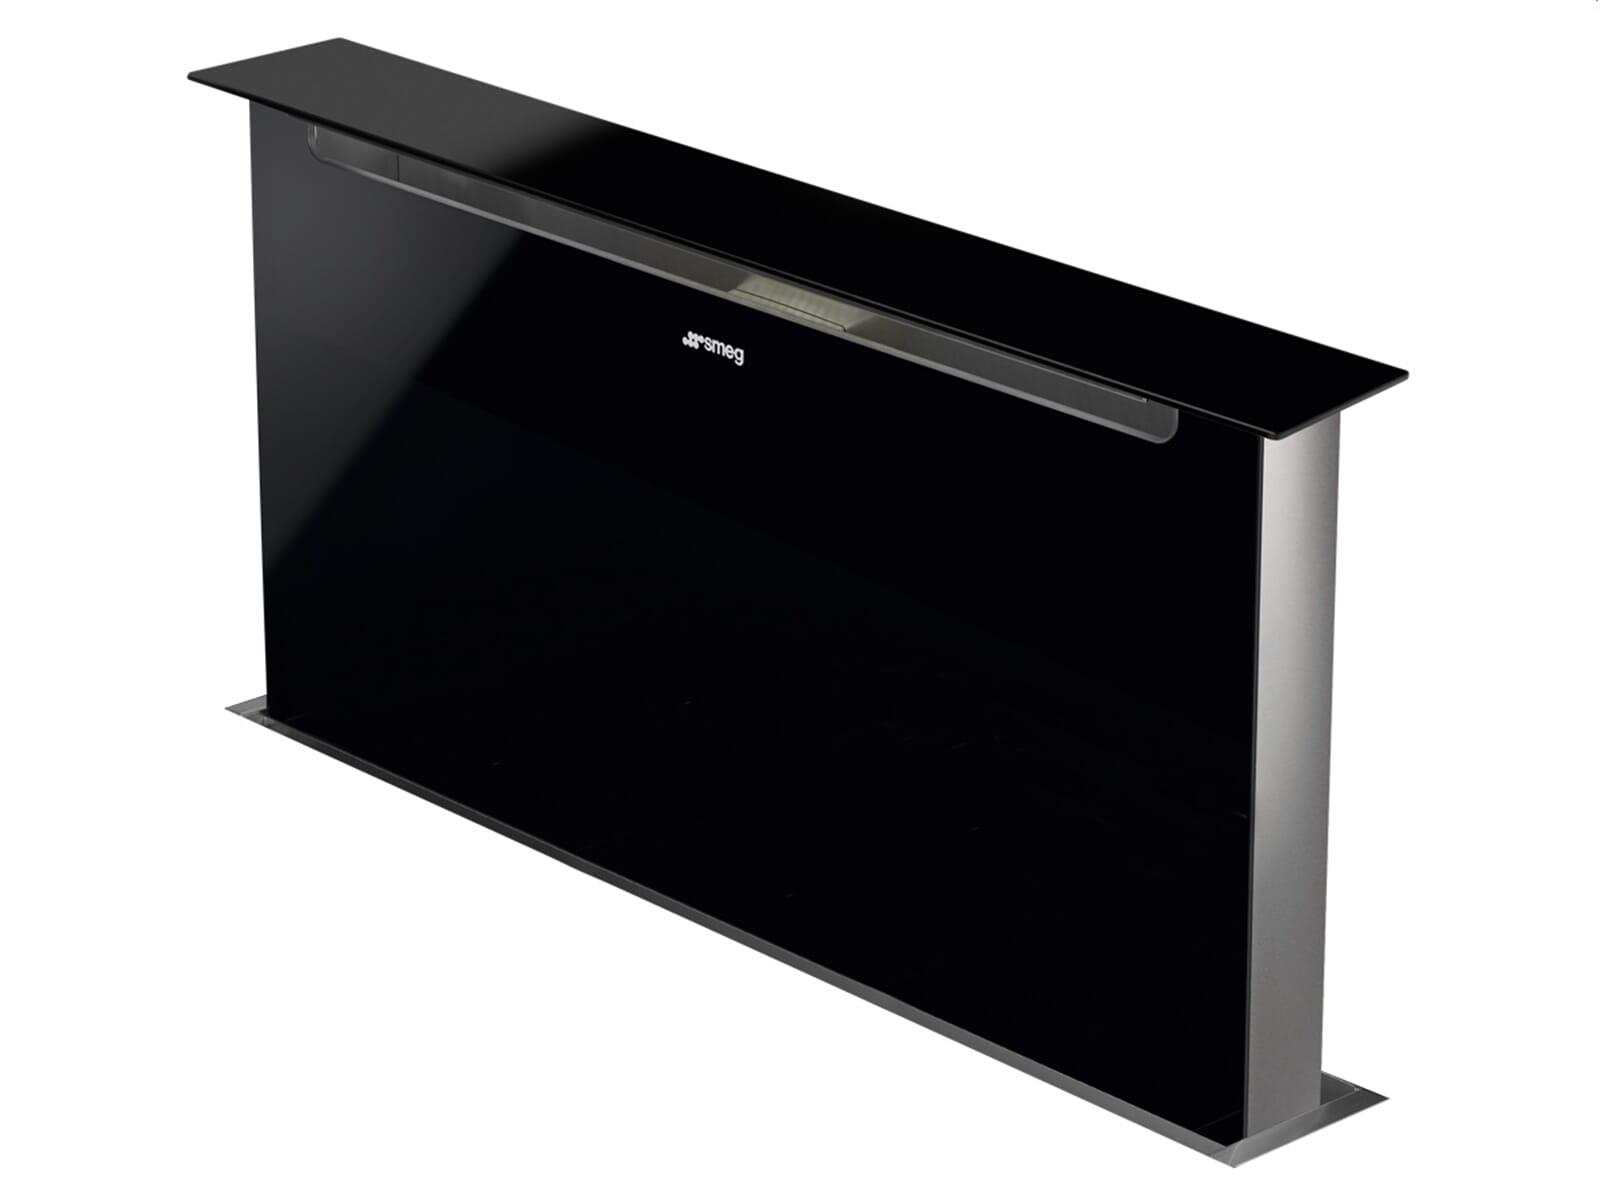 Smeg Kühlschrank Rückseite : Smeg ksdd vn tischhaube schwarz